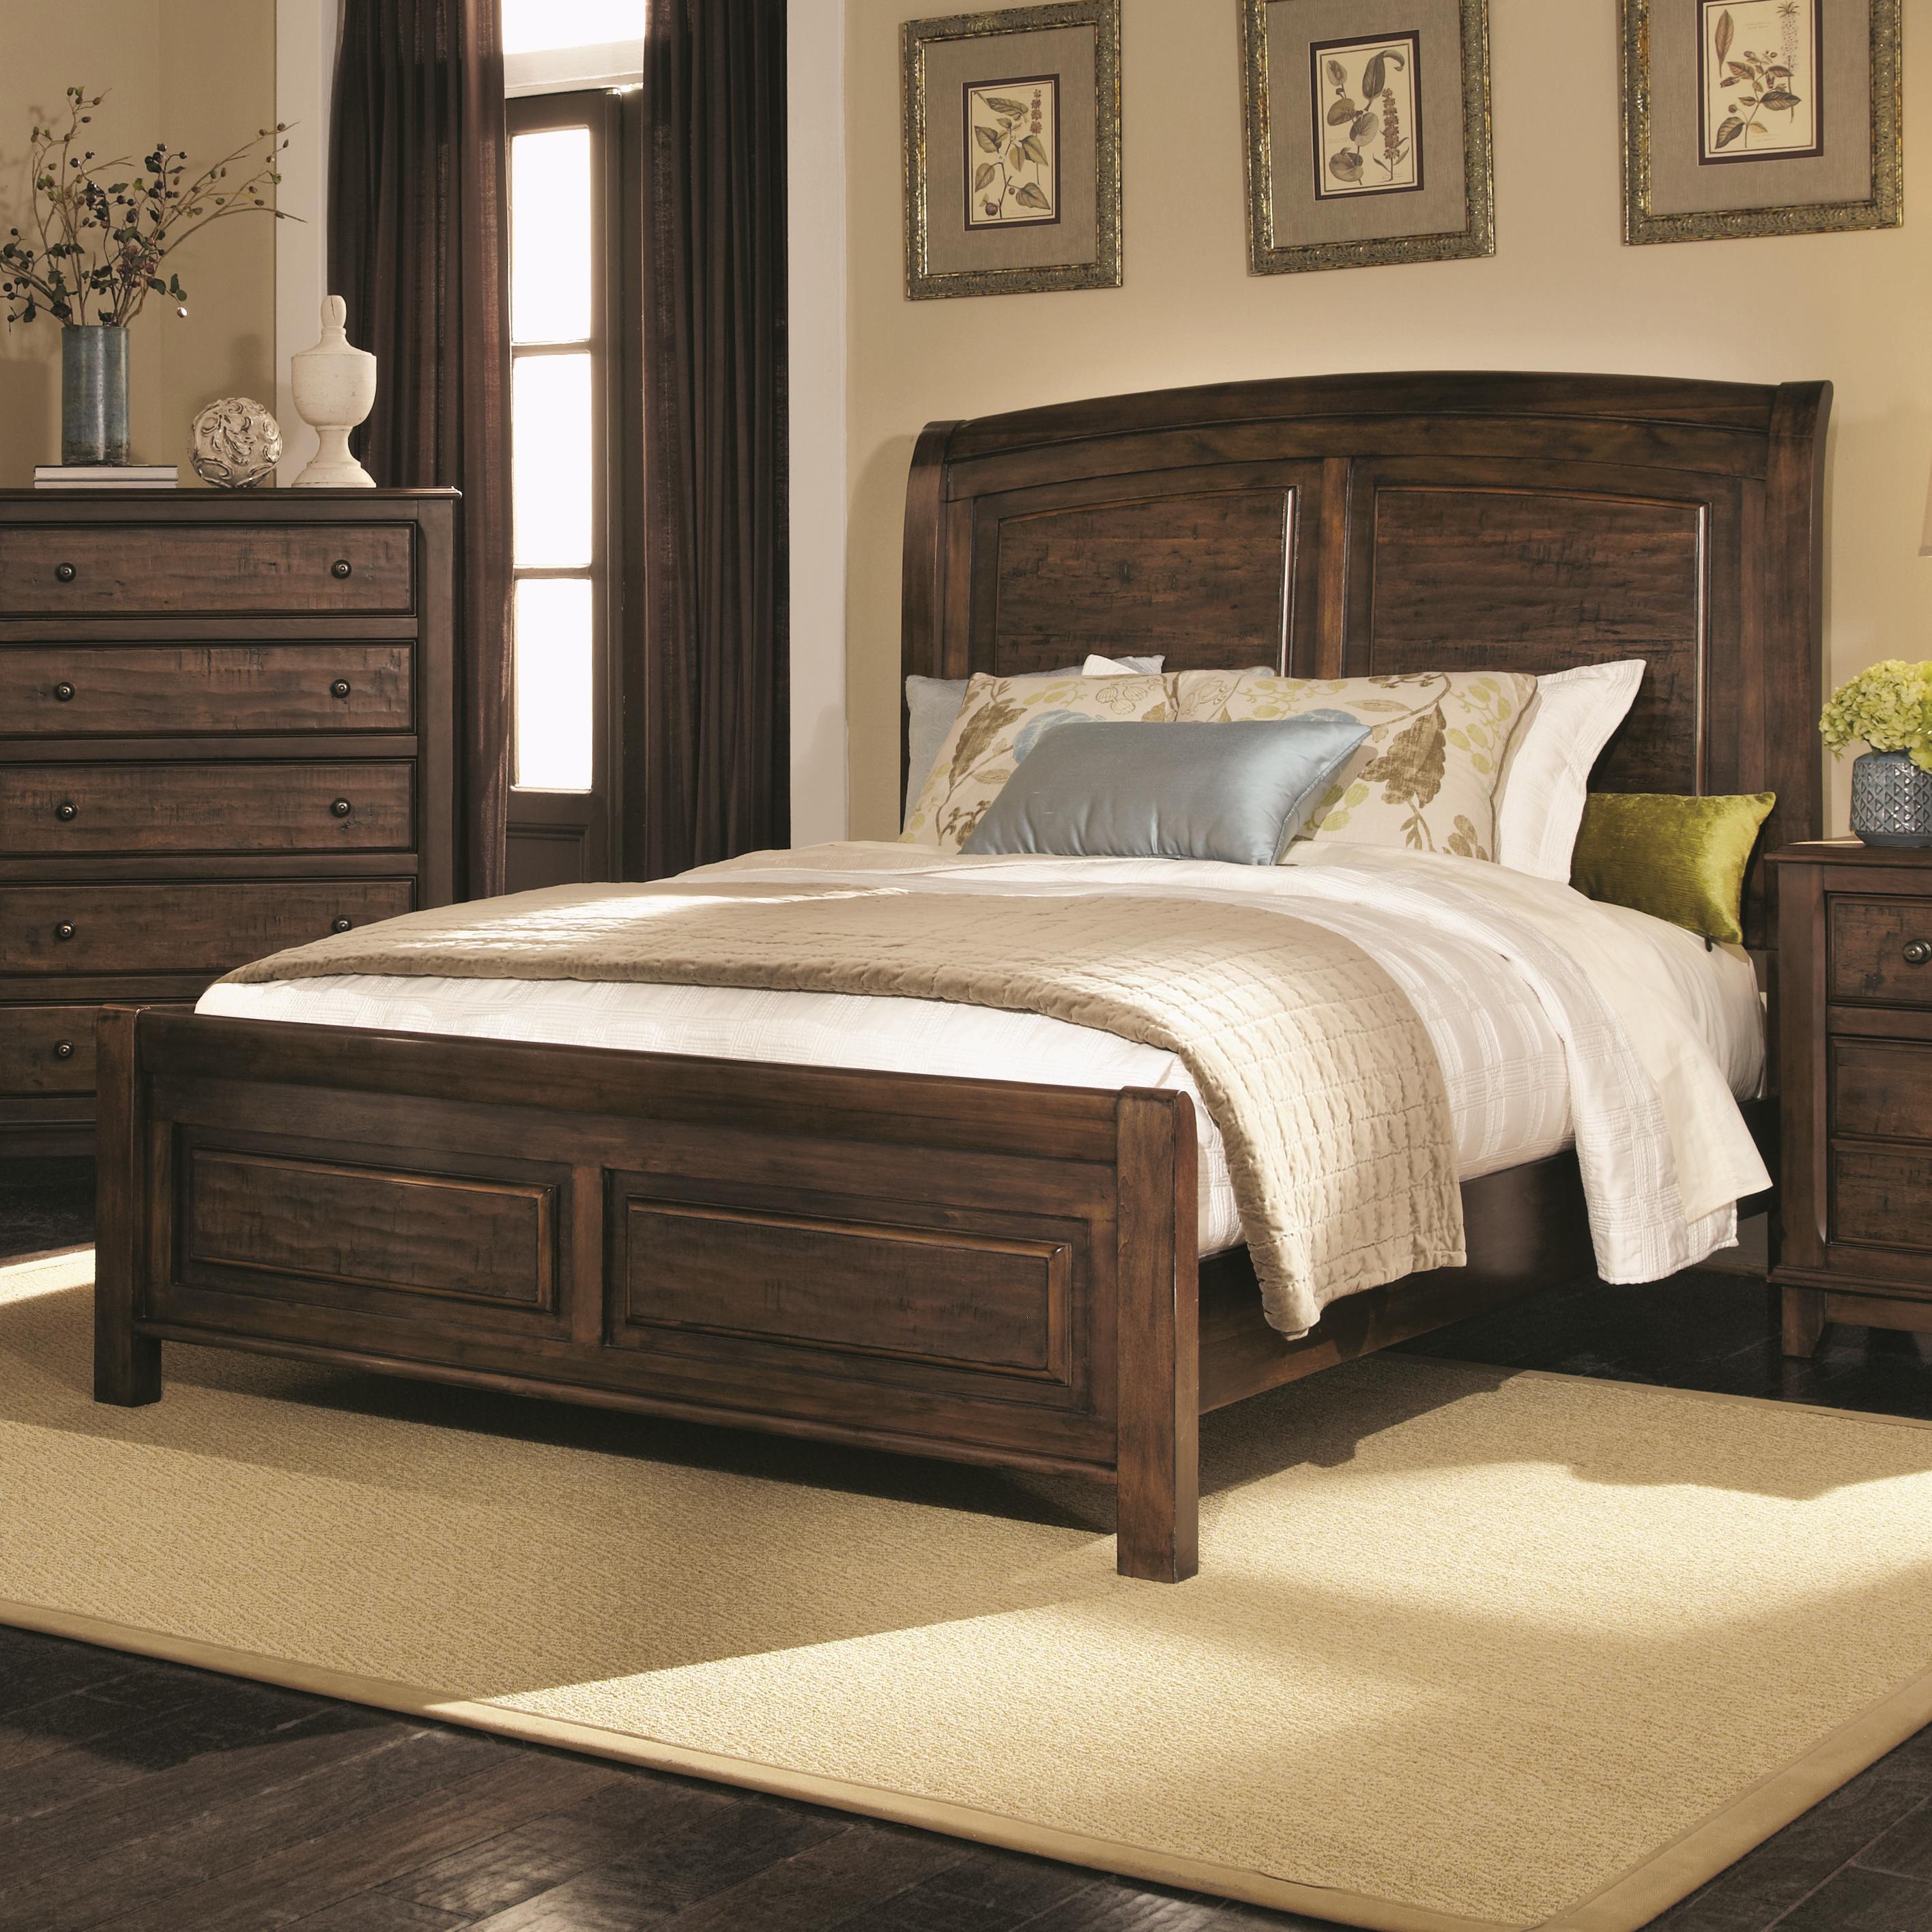 Coaster Laughton King Sleigh Bed - Item Number: 203260KE